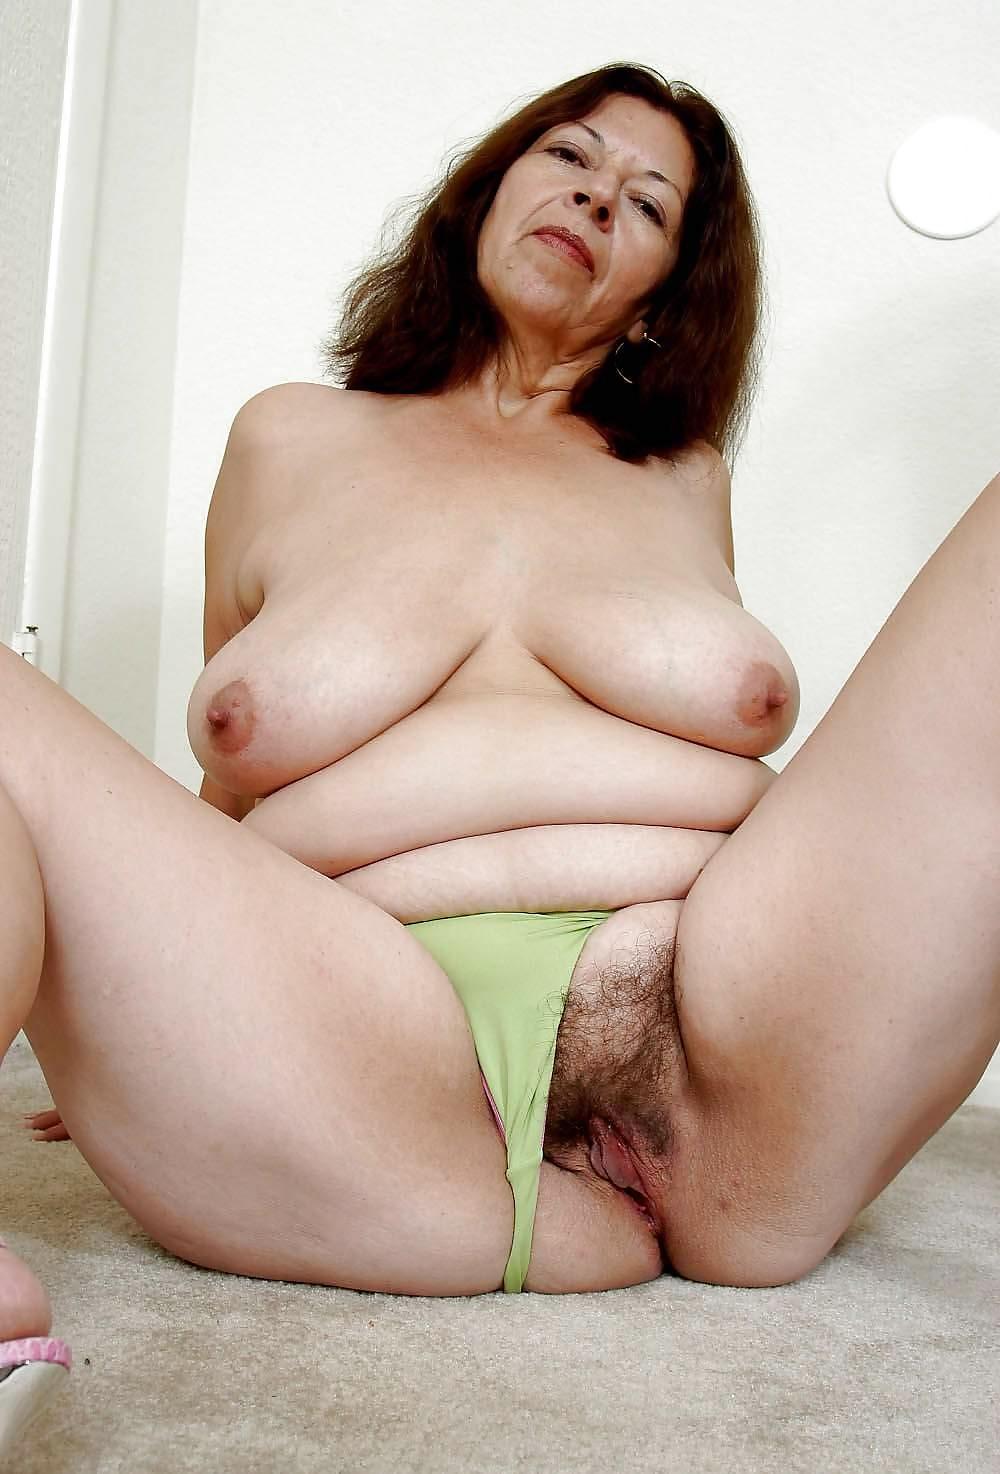 Big hairy pussy women